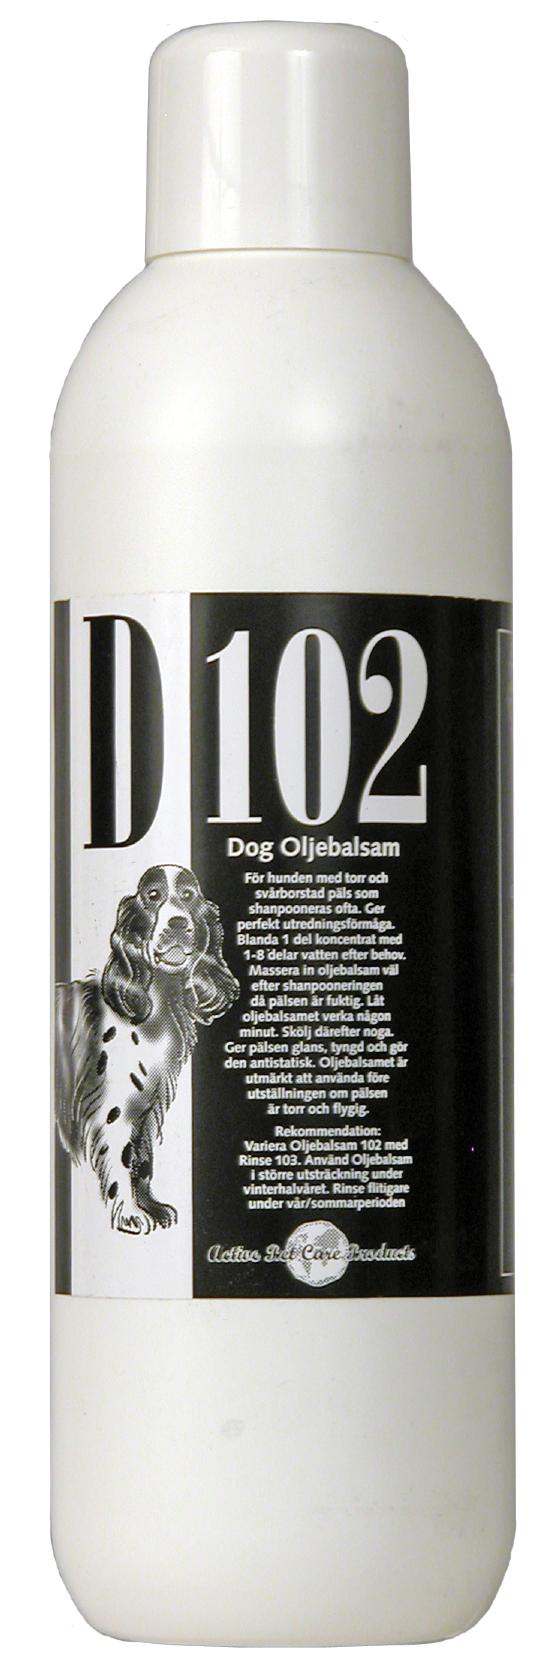 Bilde av Active Pet Care D102 Hund Oljebalsam